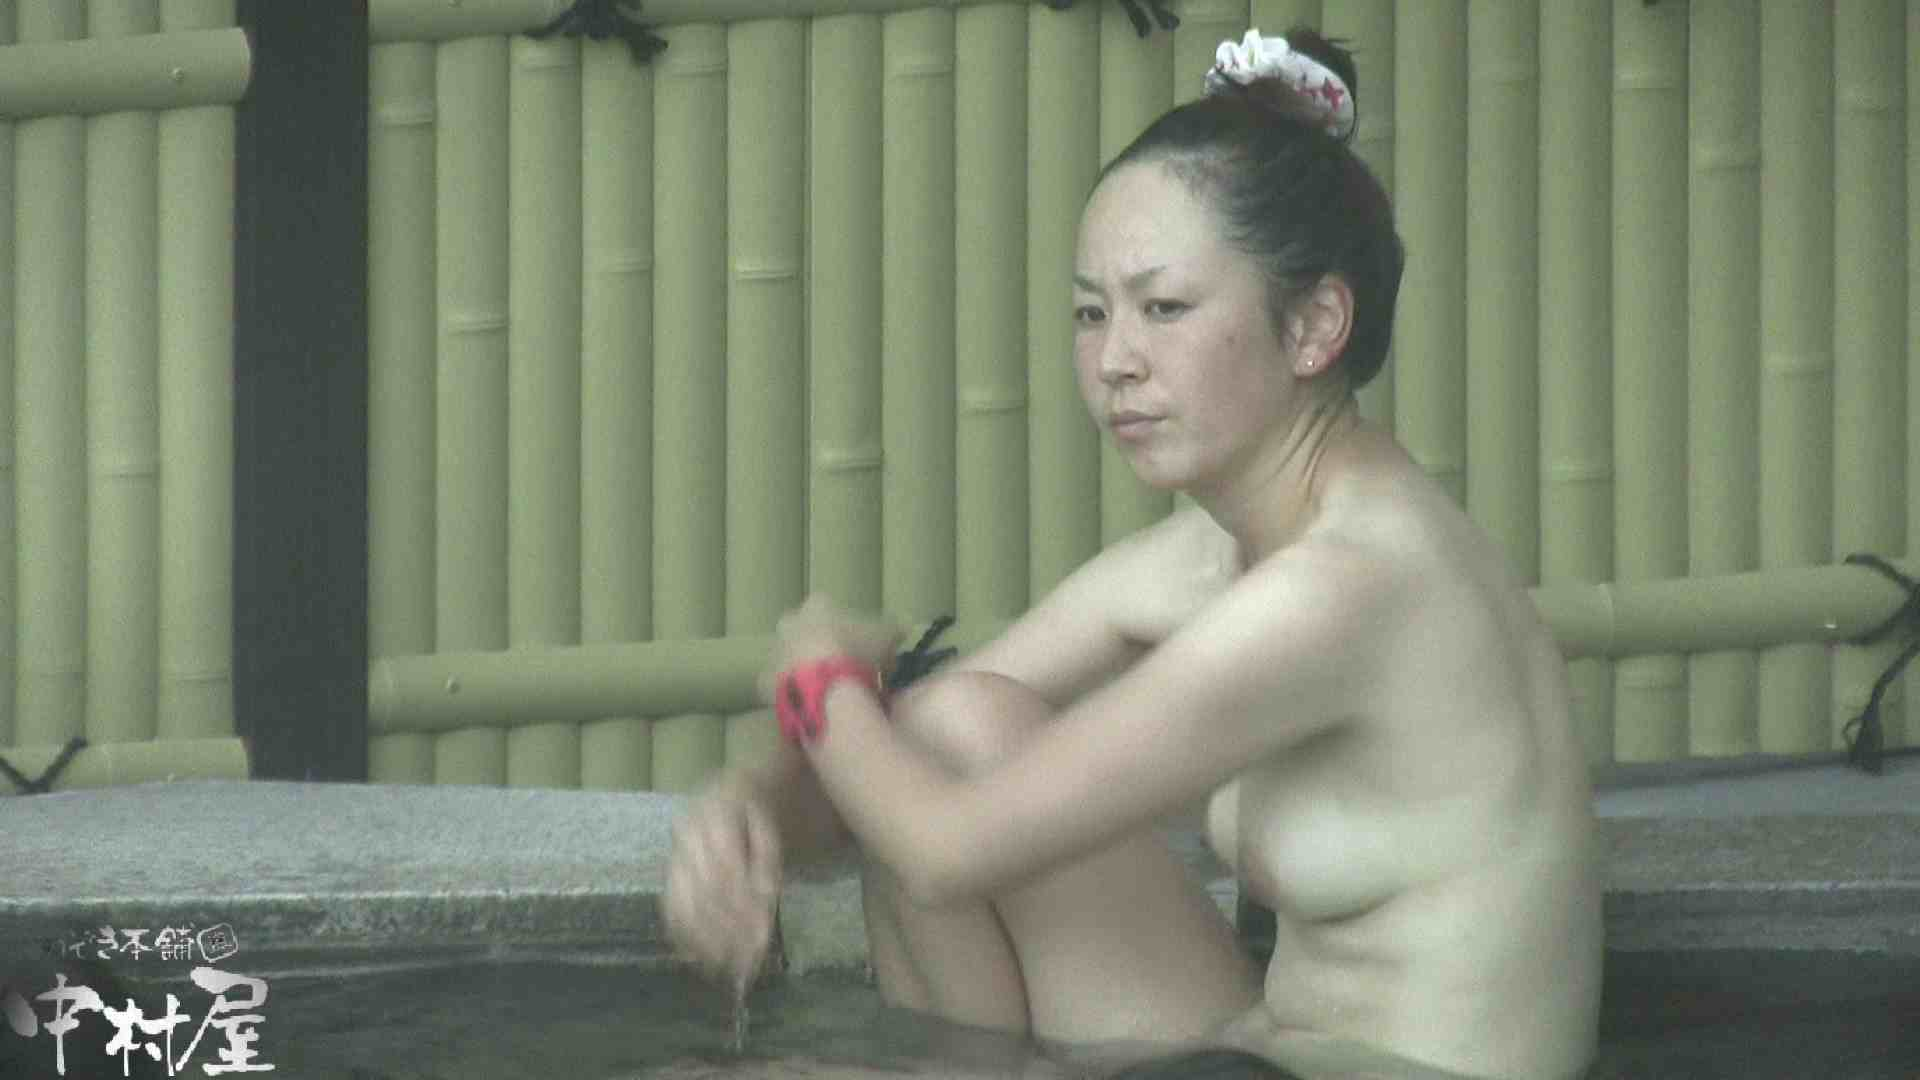 Aquaな露天風呂Vol.911 0  88連発 34